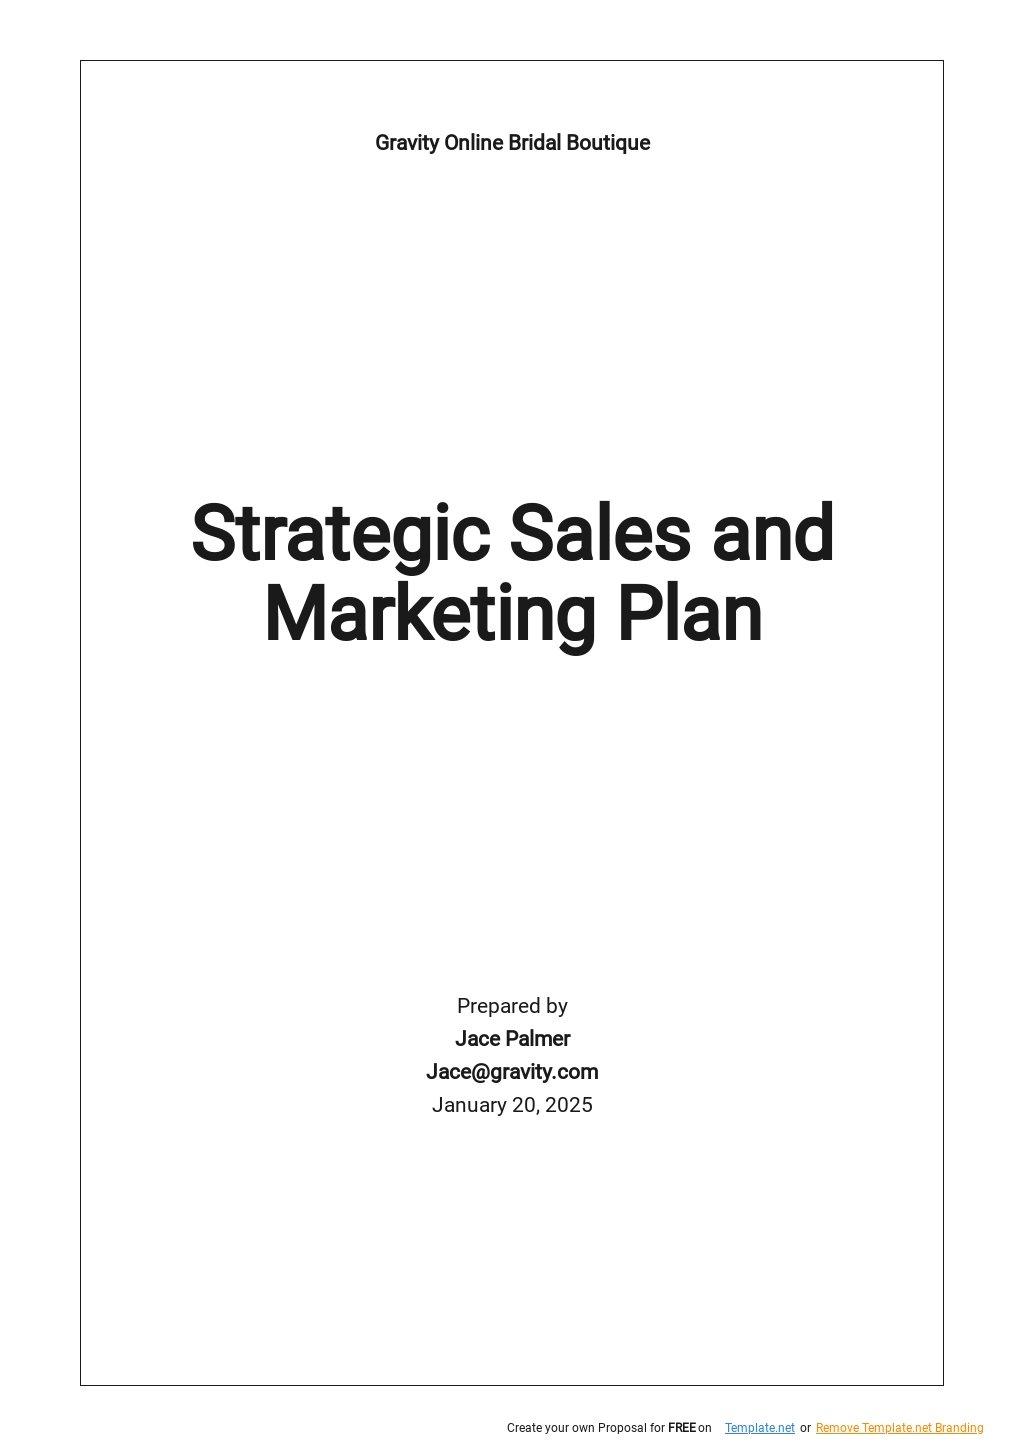 Strategic Sales and Marketing Plan Template.jpe